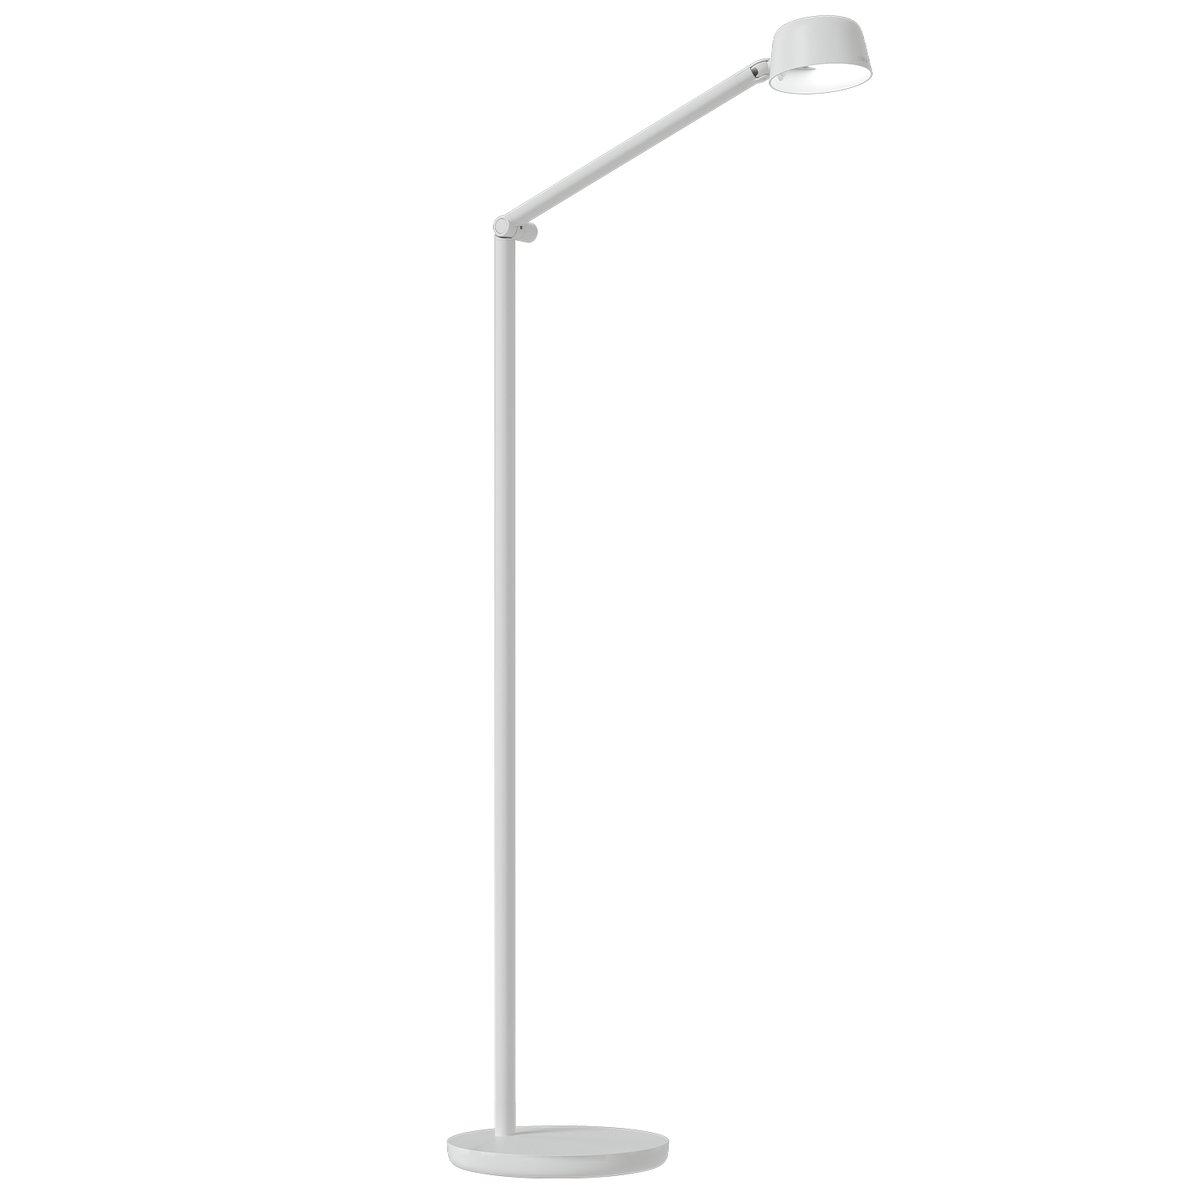 Luxo Motus Floor-2 Floor Lamp, White